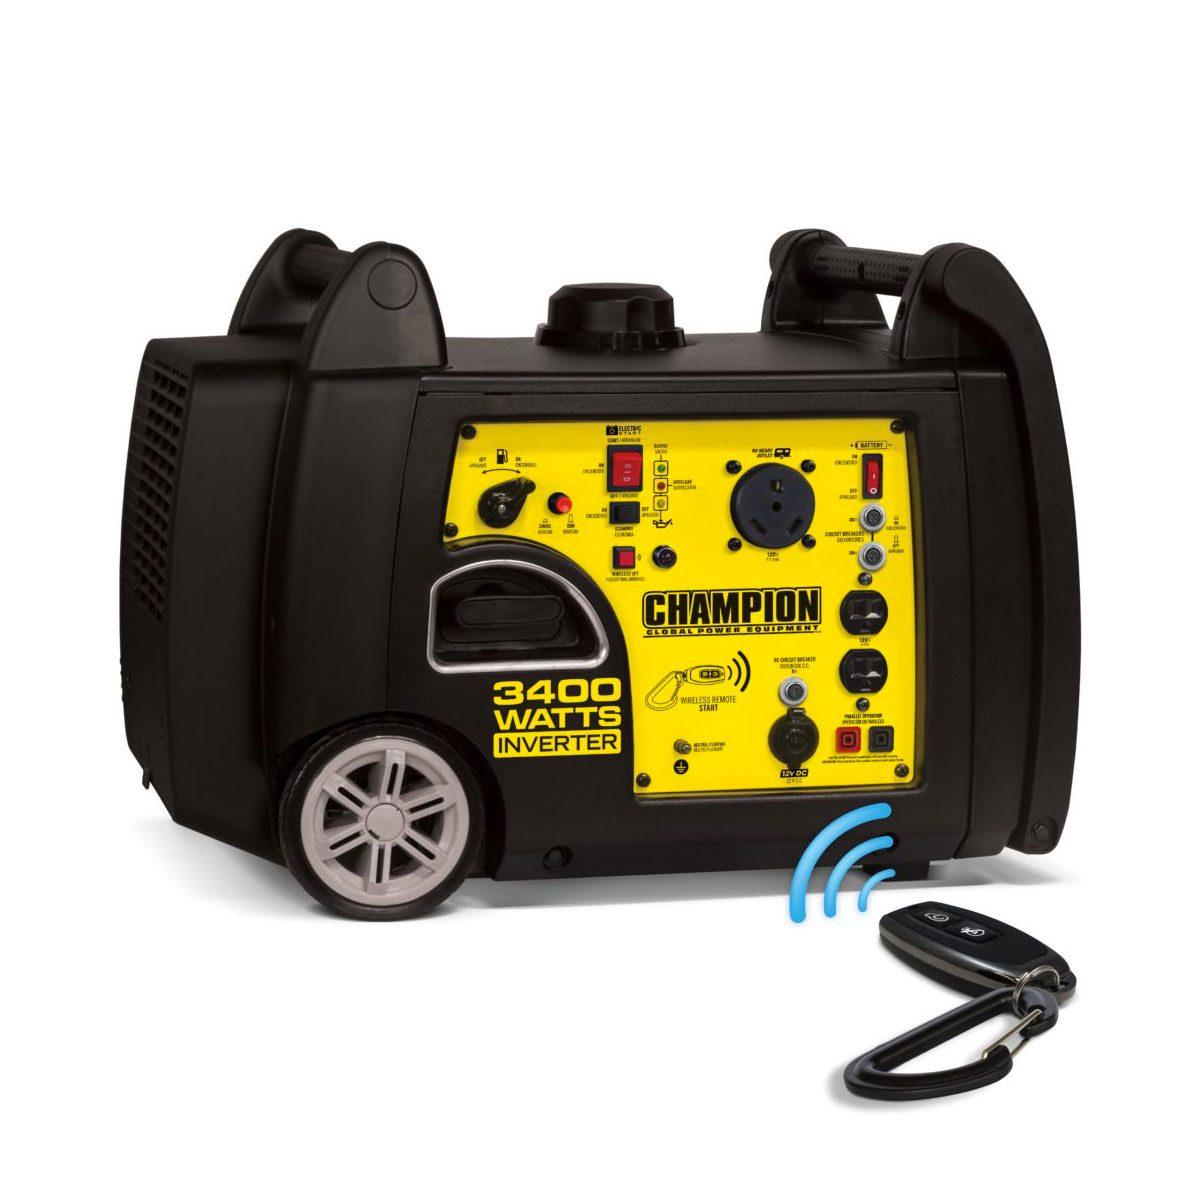 Photo of a Champion generator